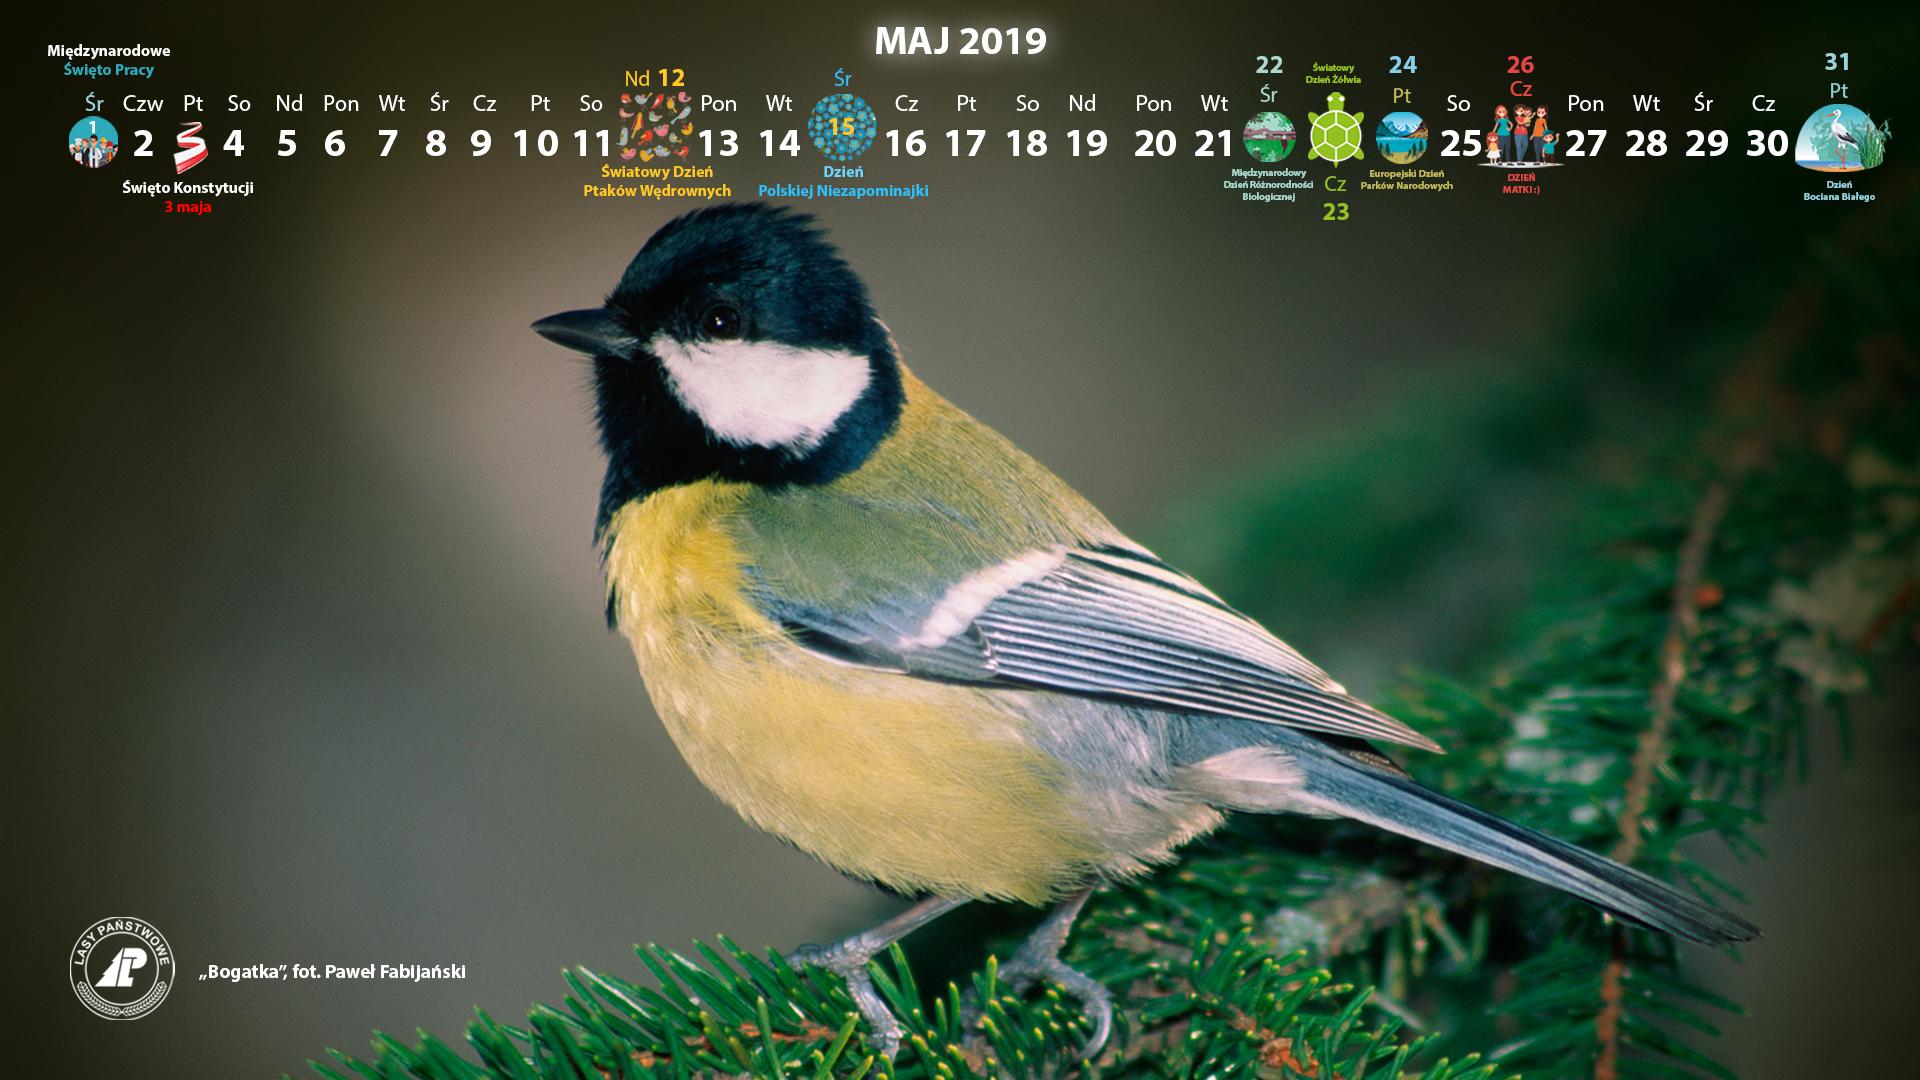 Kalendarz_maj_2019_1920x1080[1].jpg